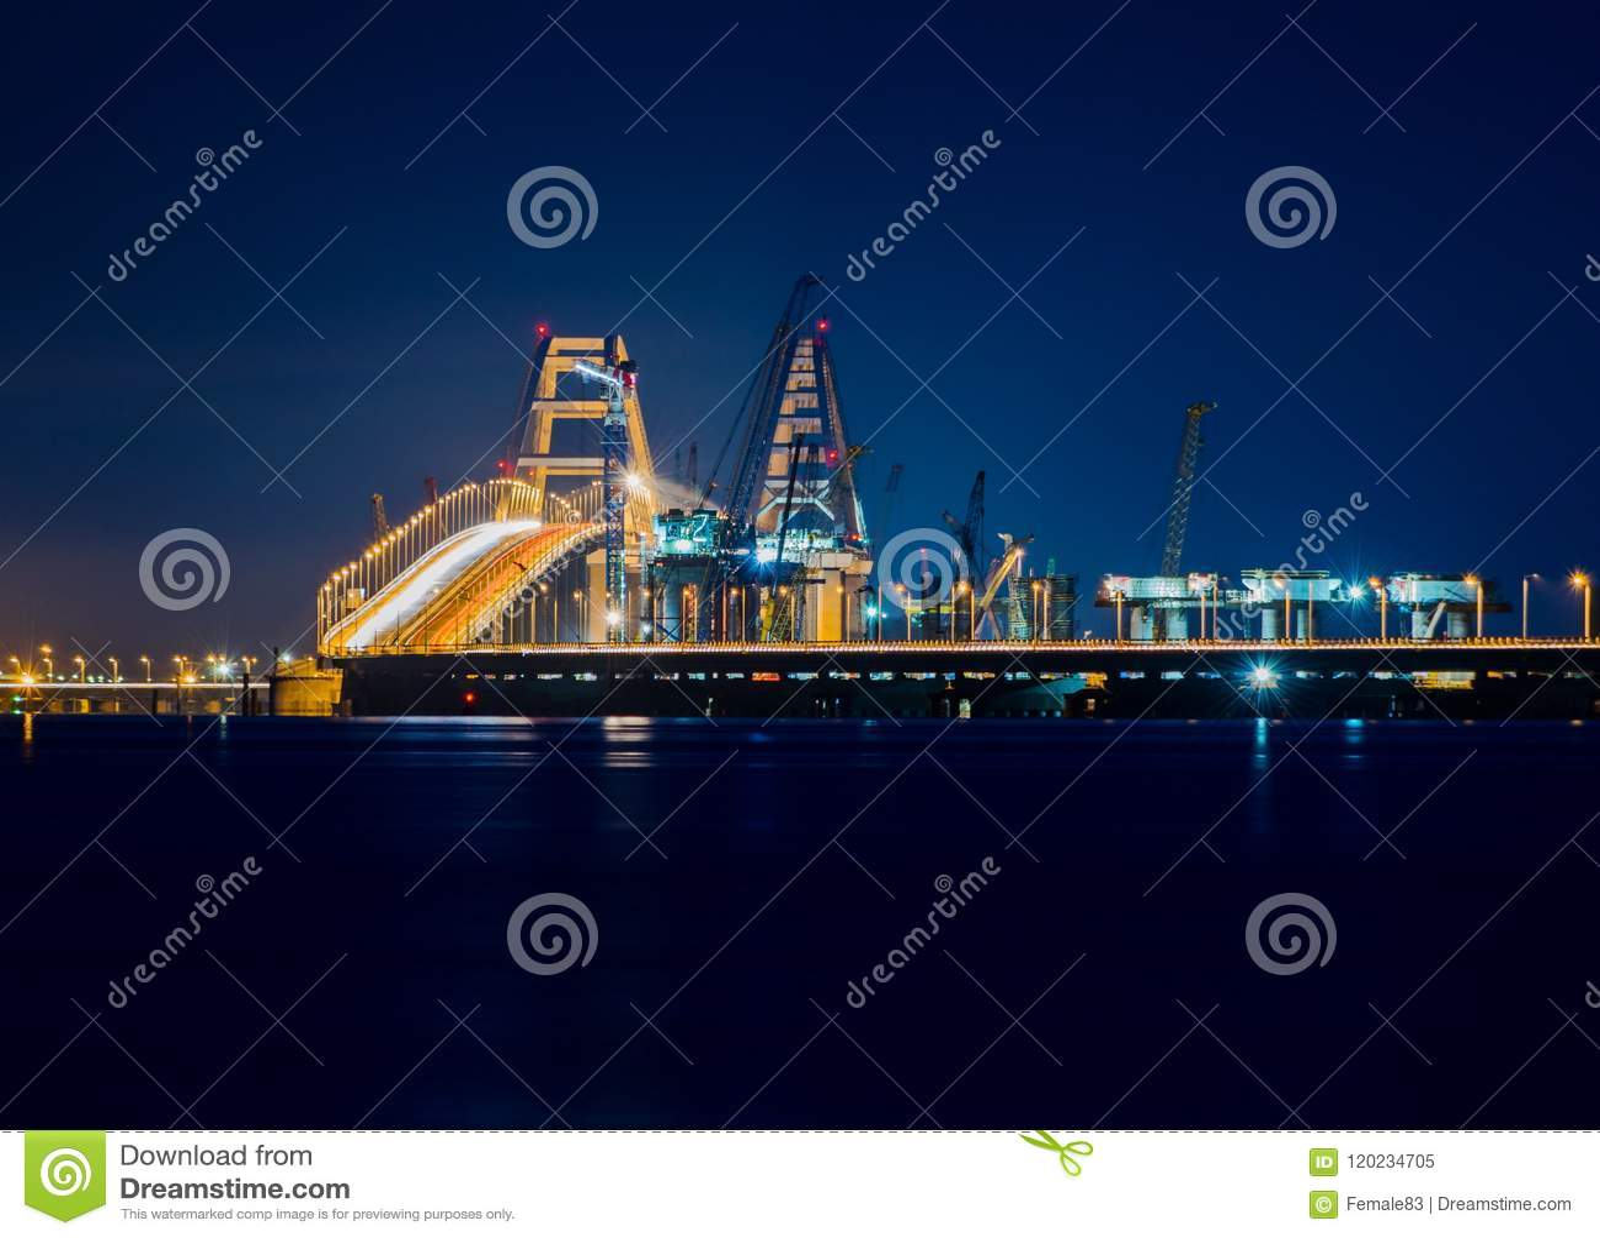 Construction Of The Crimean Bridge In Kerch Strait At Night Stock